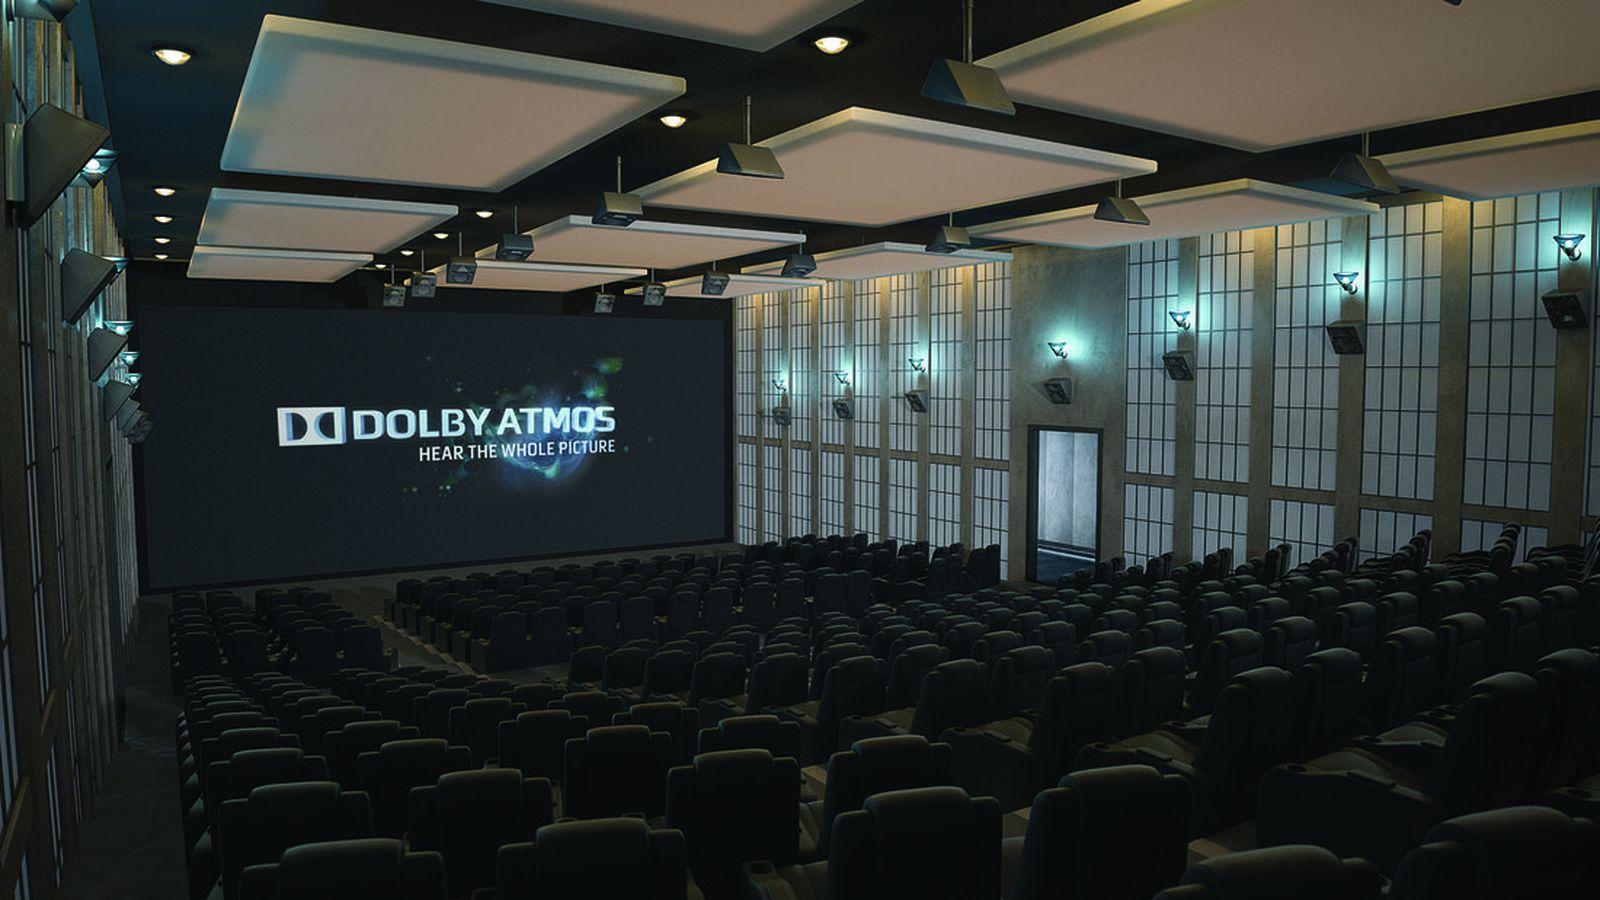 Dolby Atmos - Wikipedia